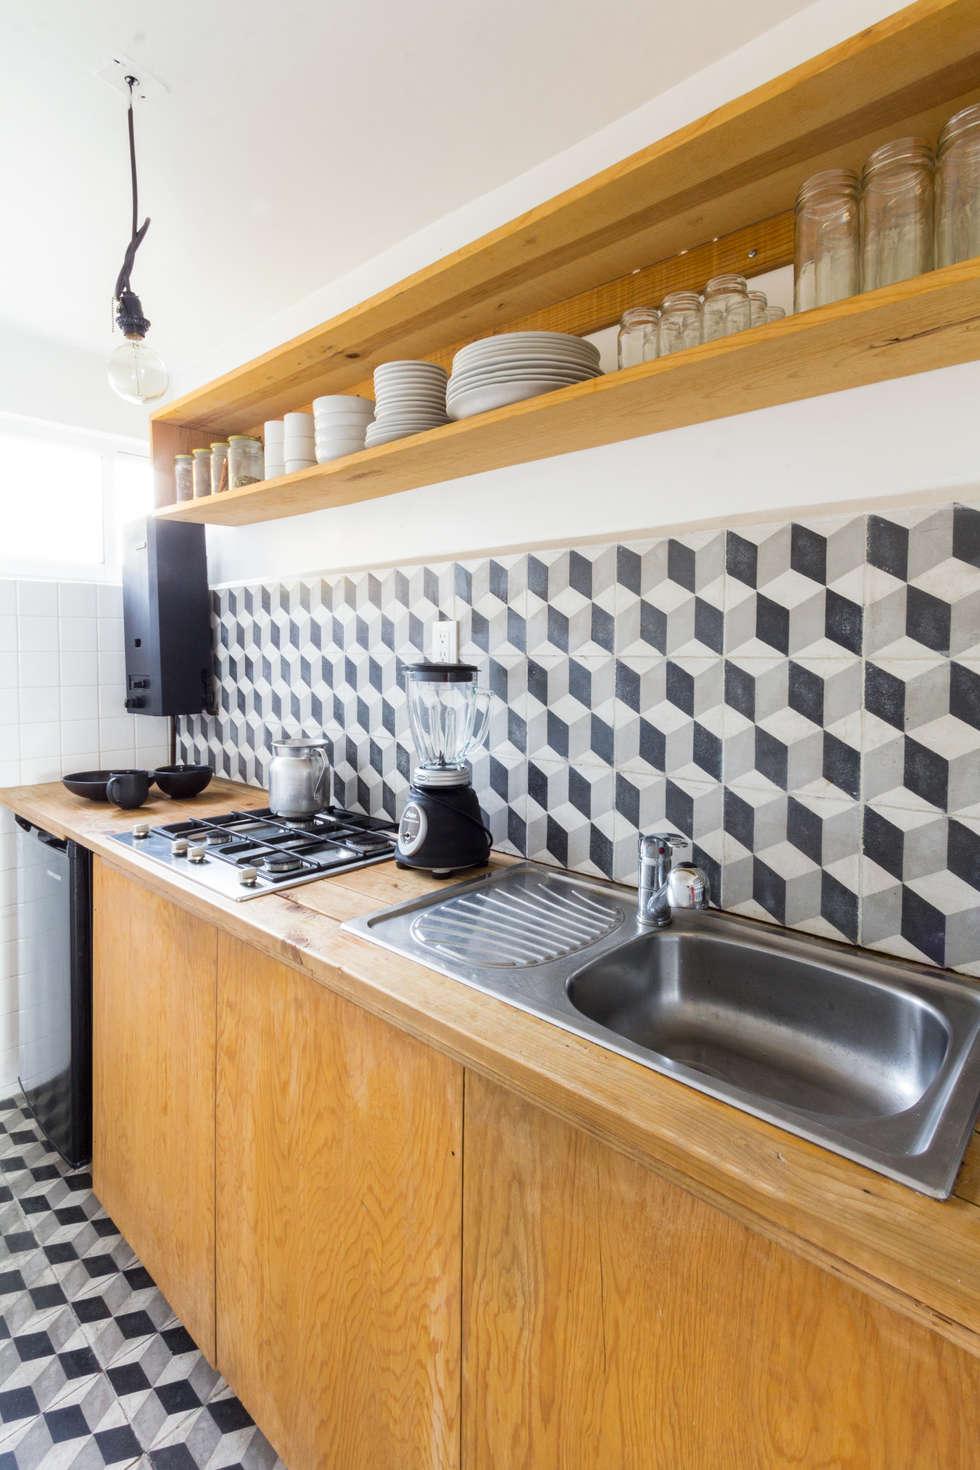 Cocina de departamento: Cocinas de estilo moderno por DOSA studio